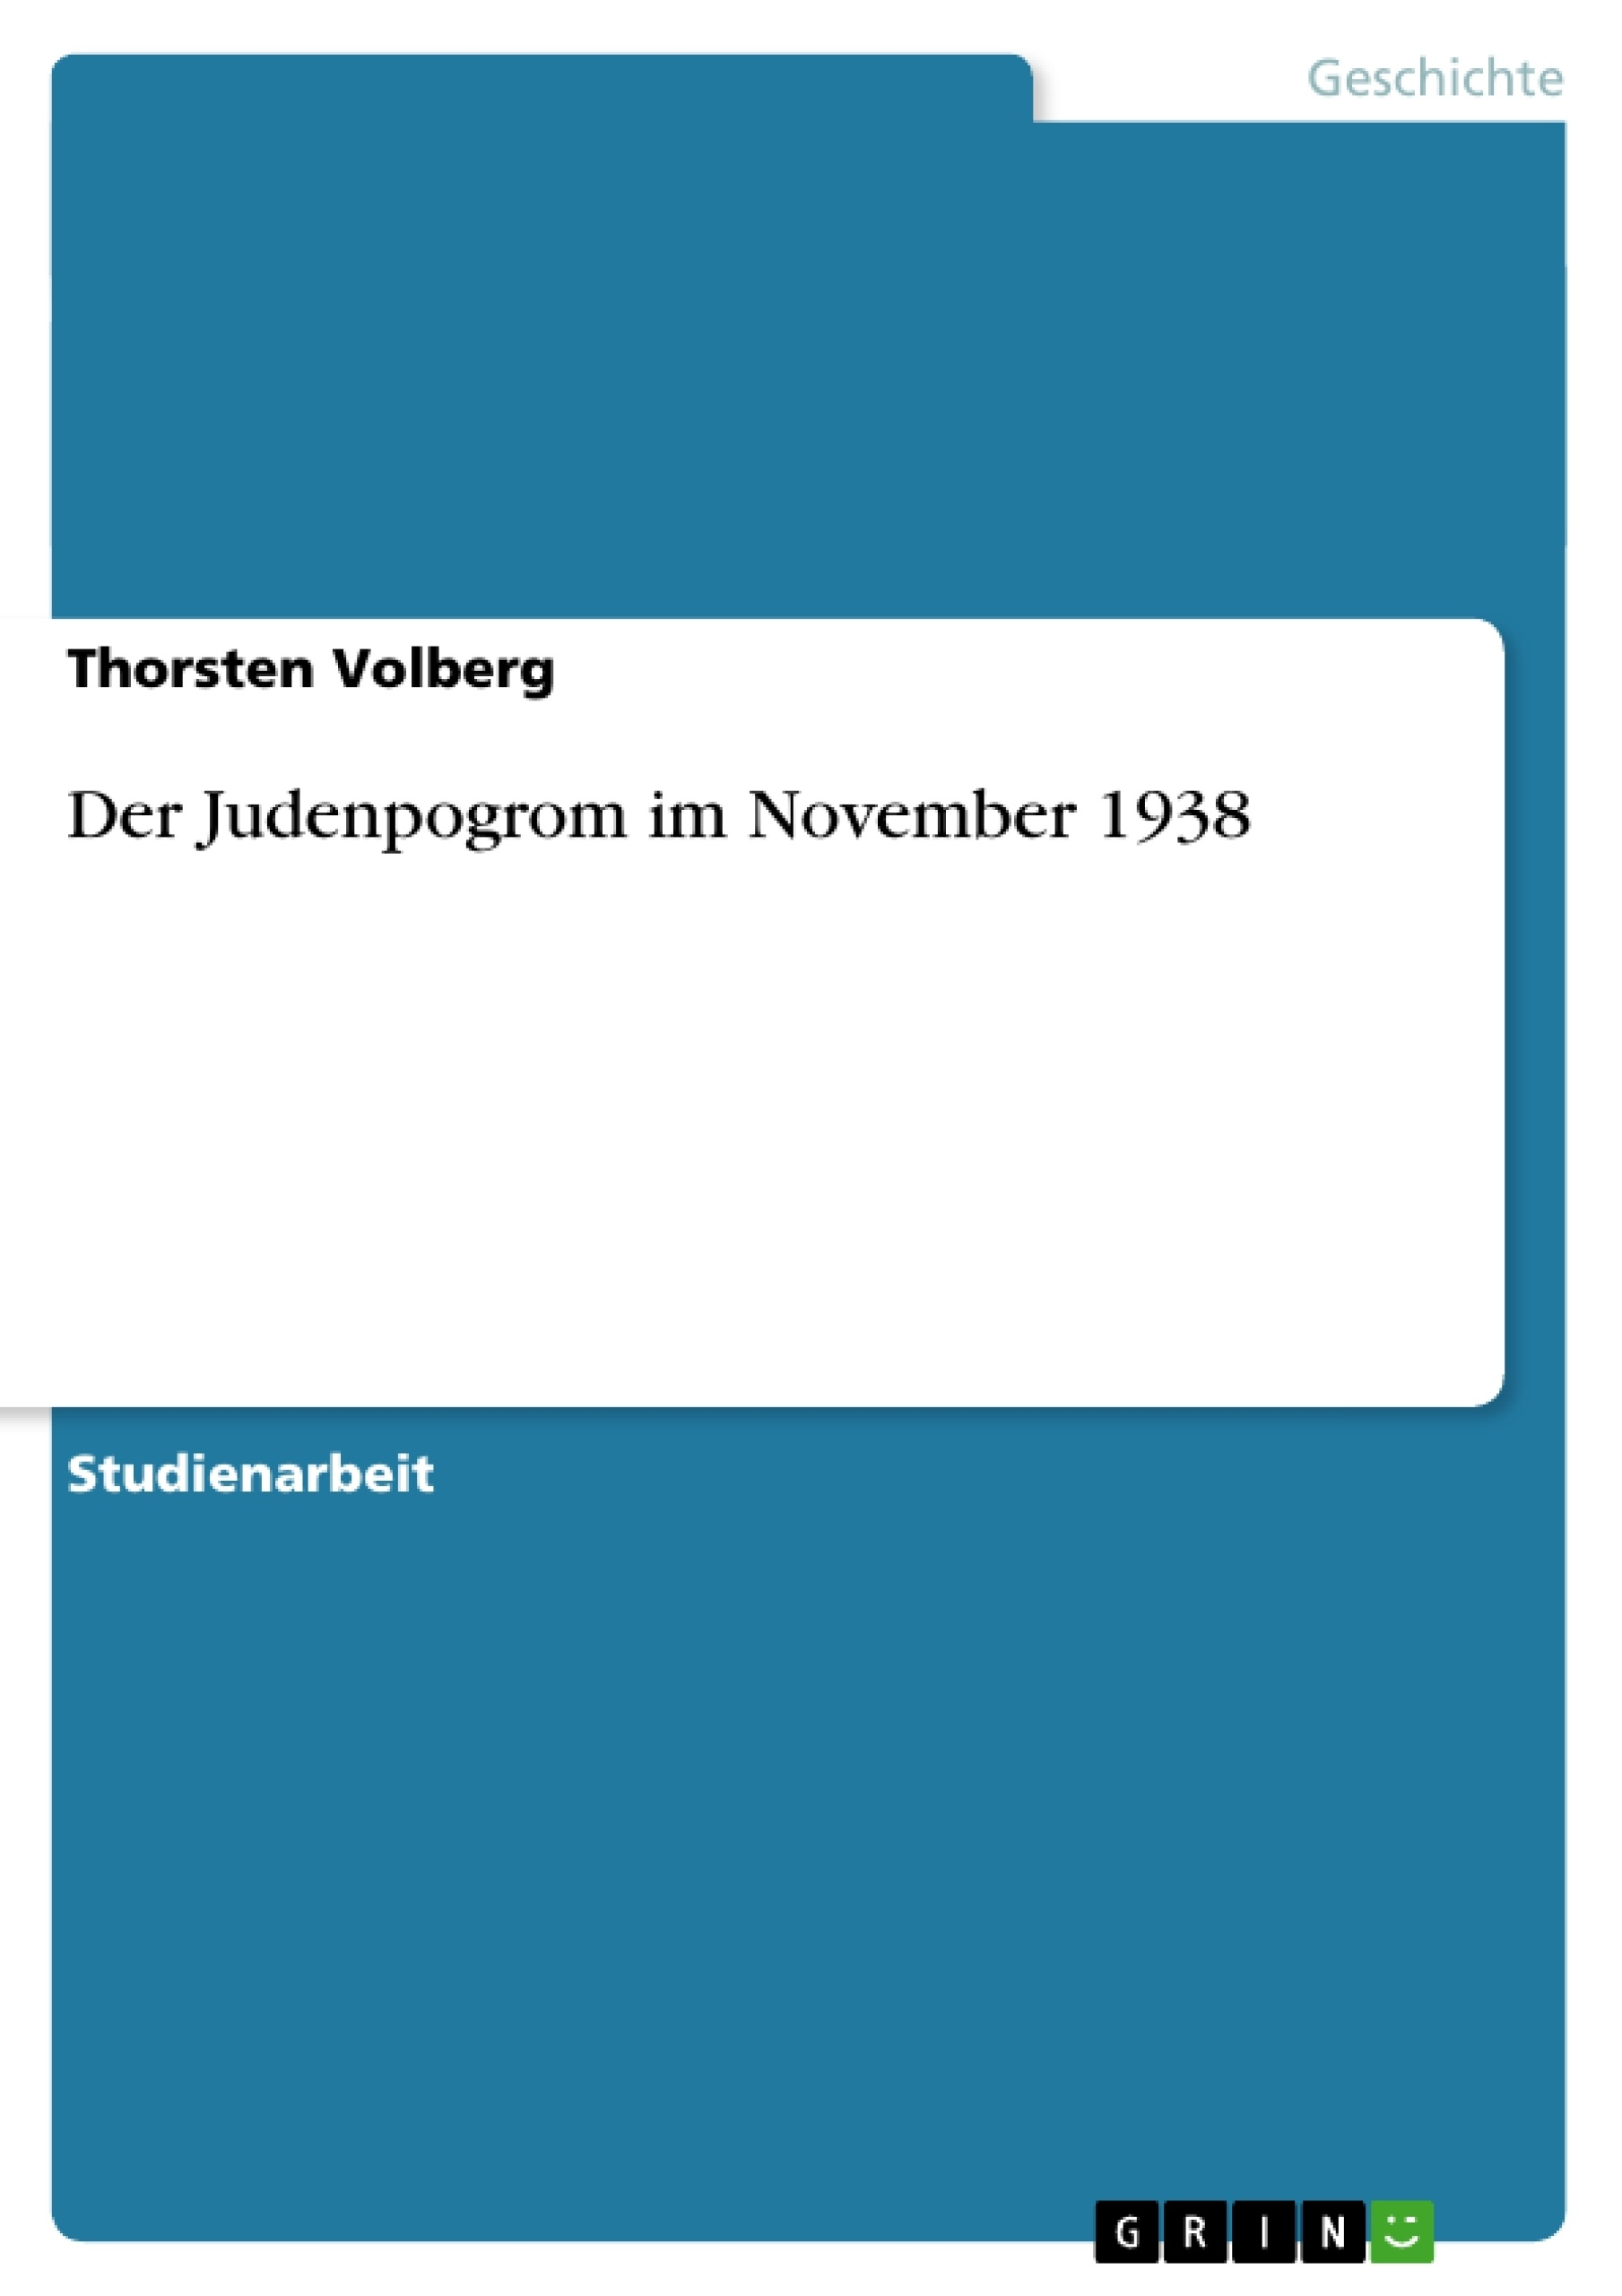 Titel: Der Judenpogrom im November 1938